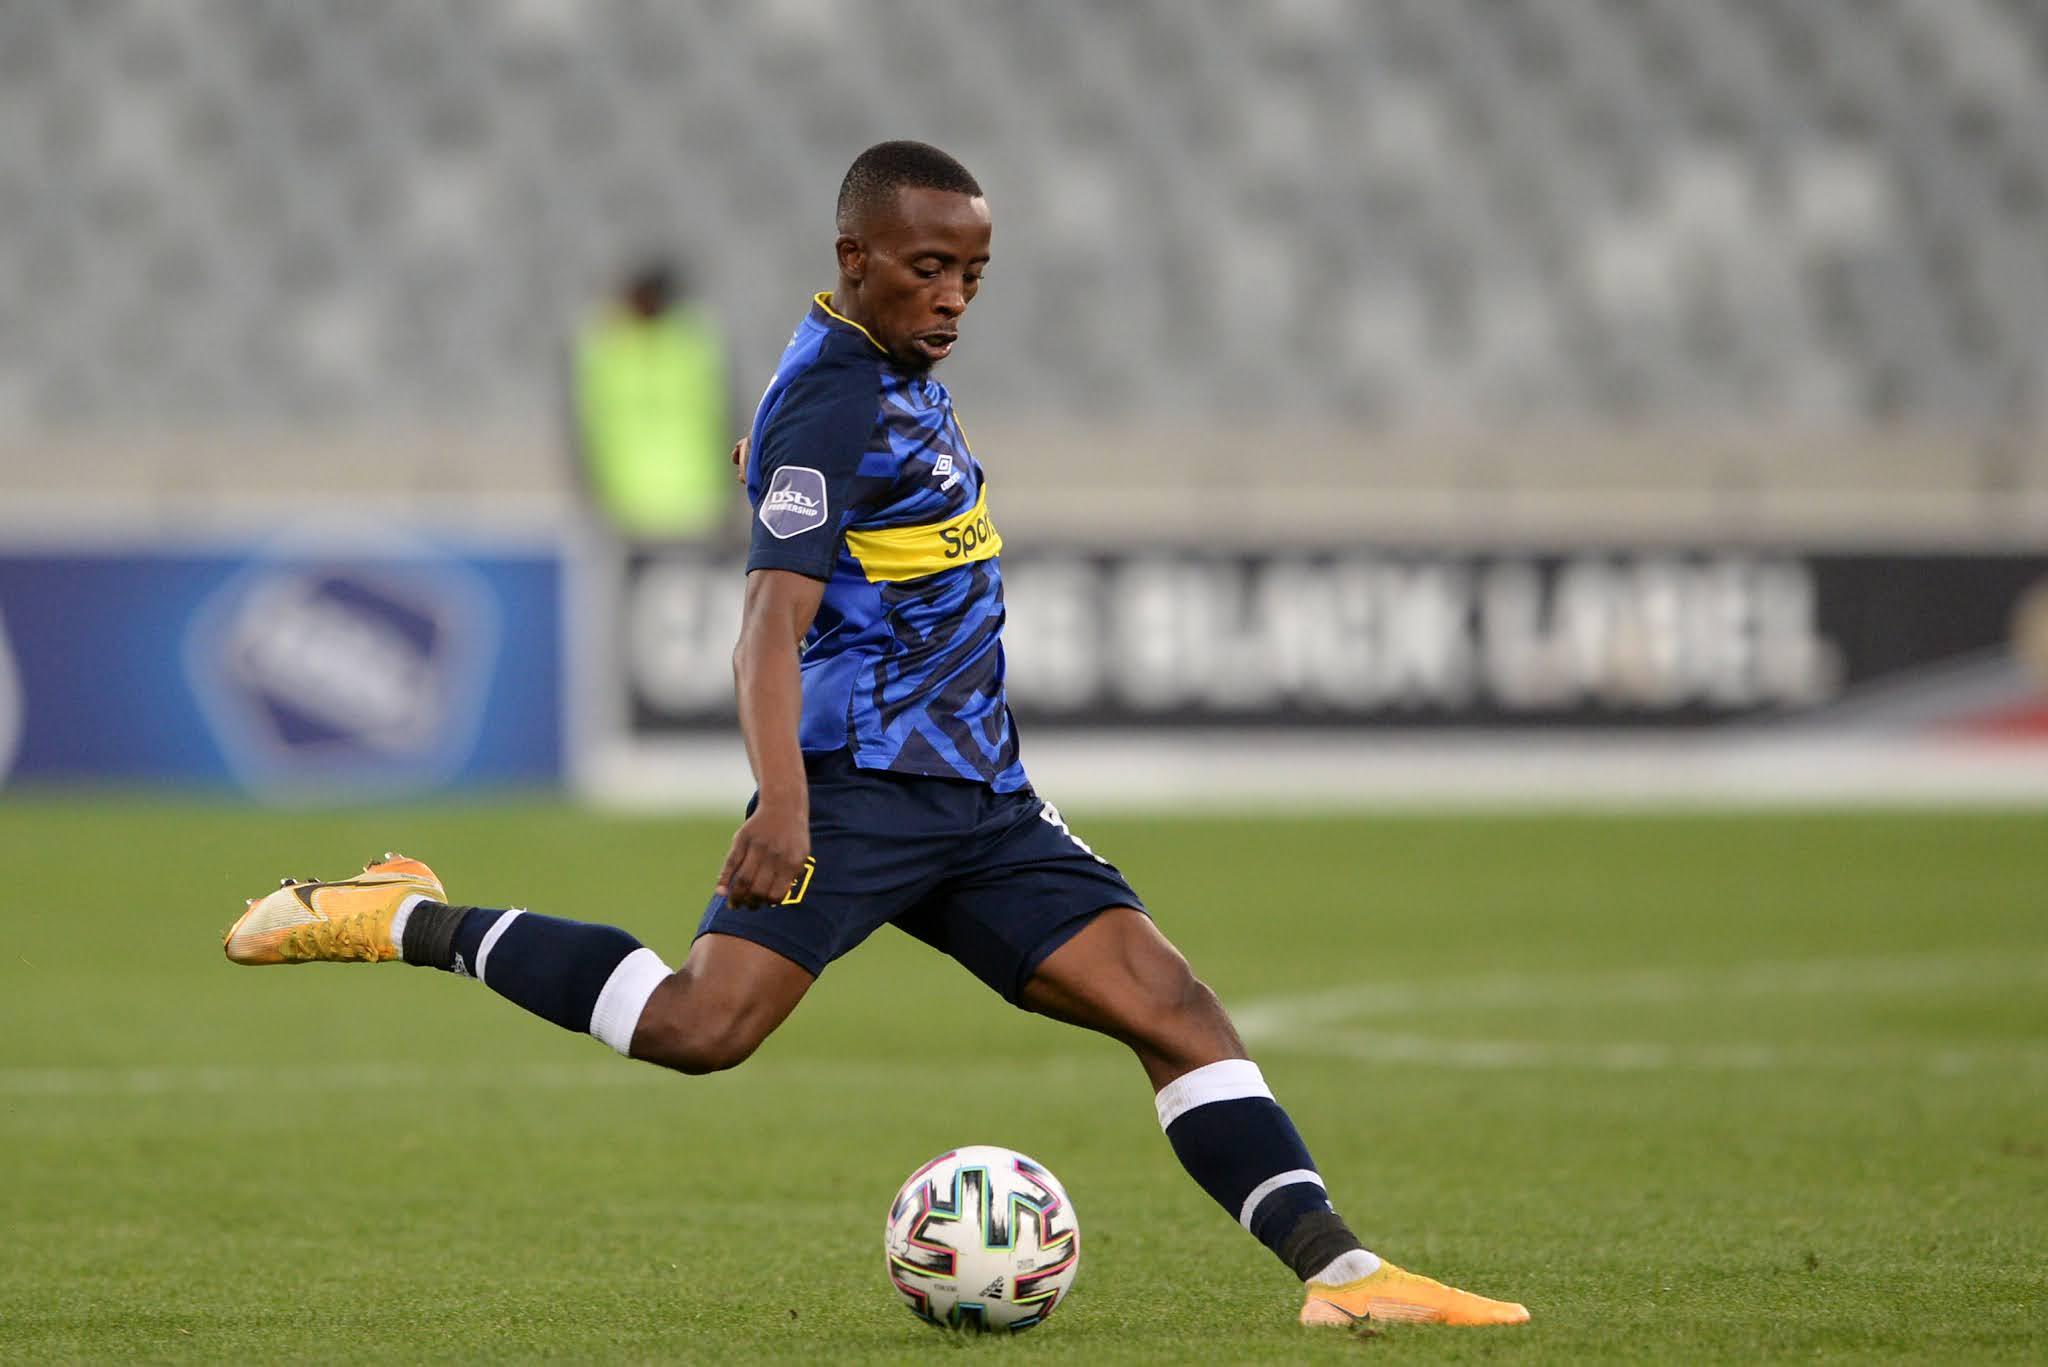 Cape Town City midfielder Thabo Nodada